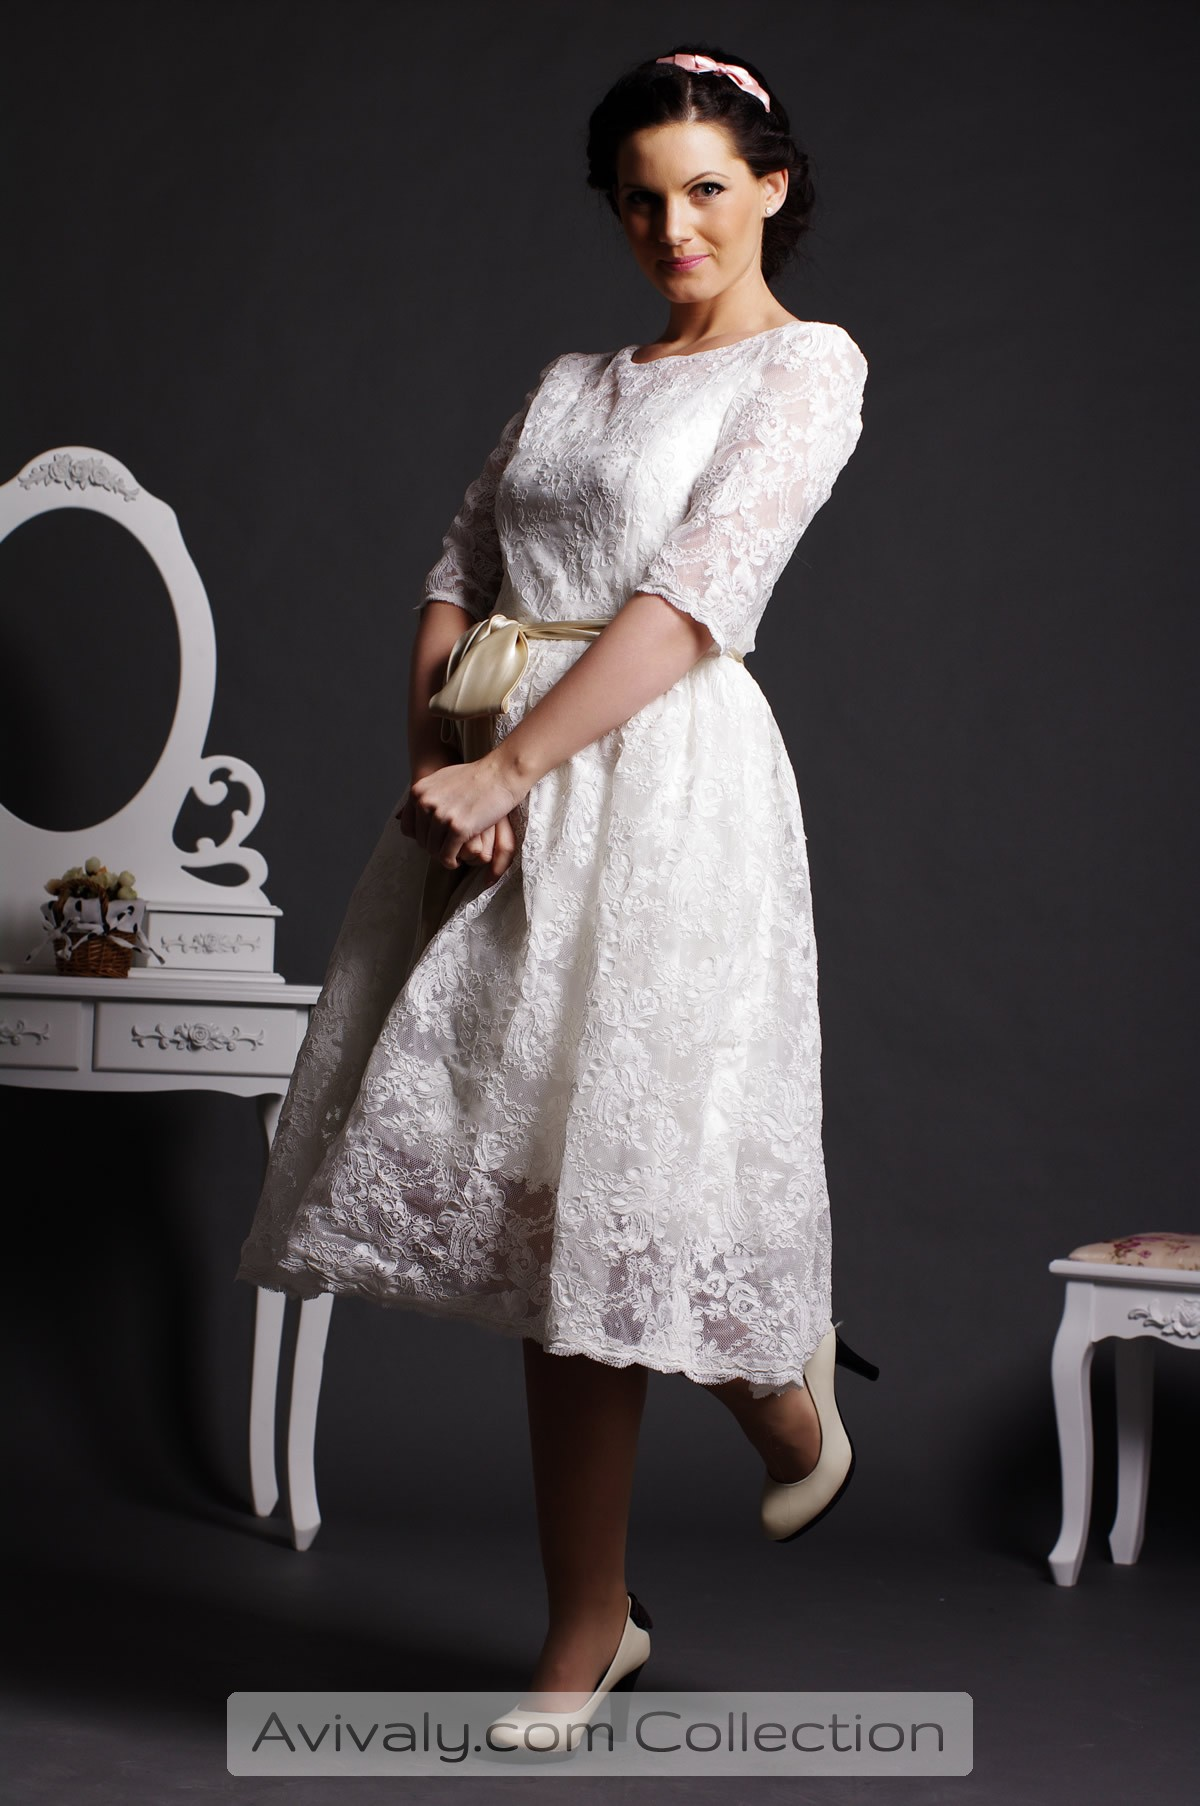 Zaza - Satin Lined Lace Tea Length Wedding Dress